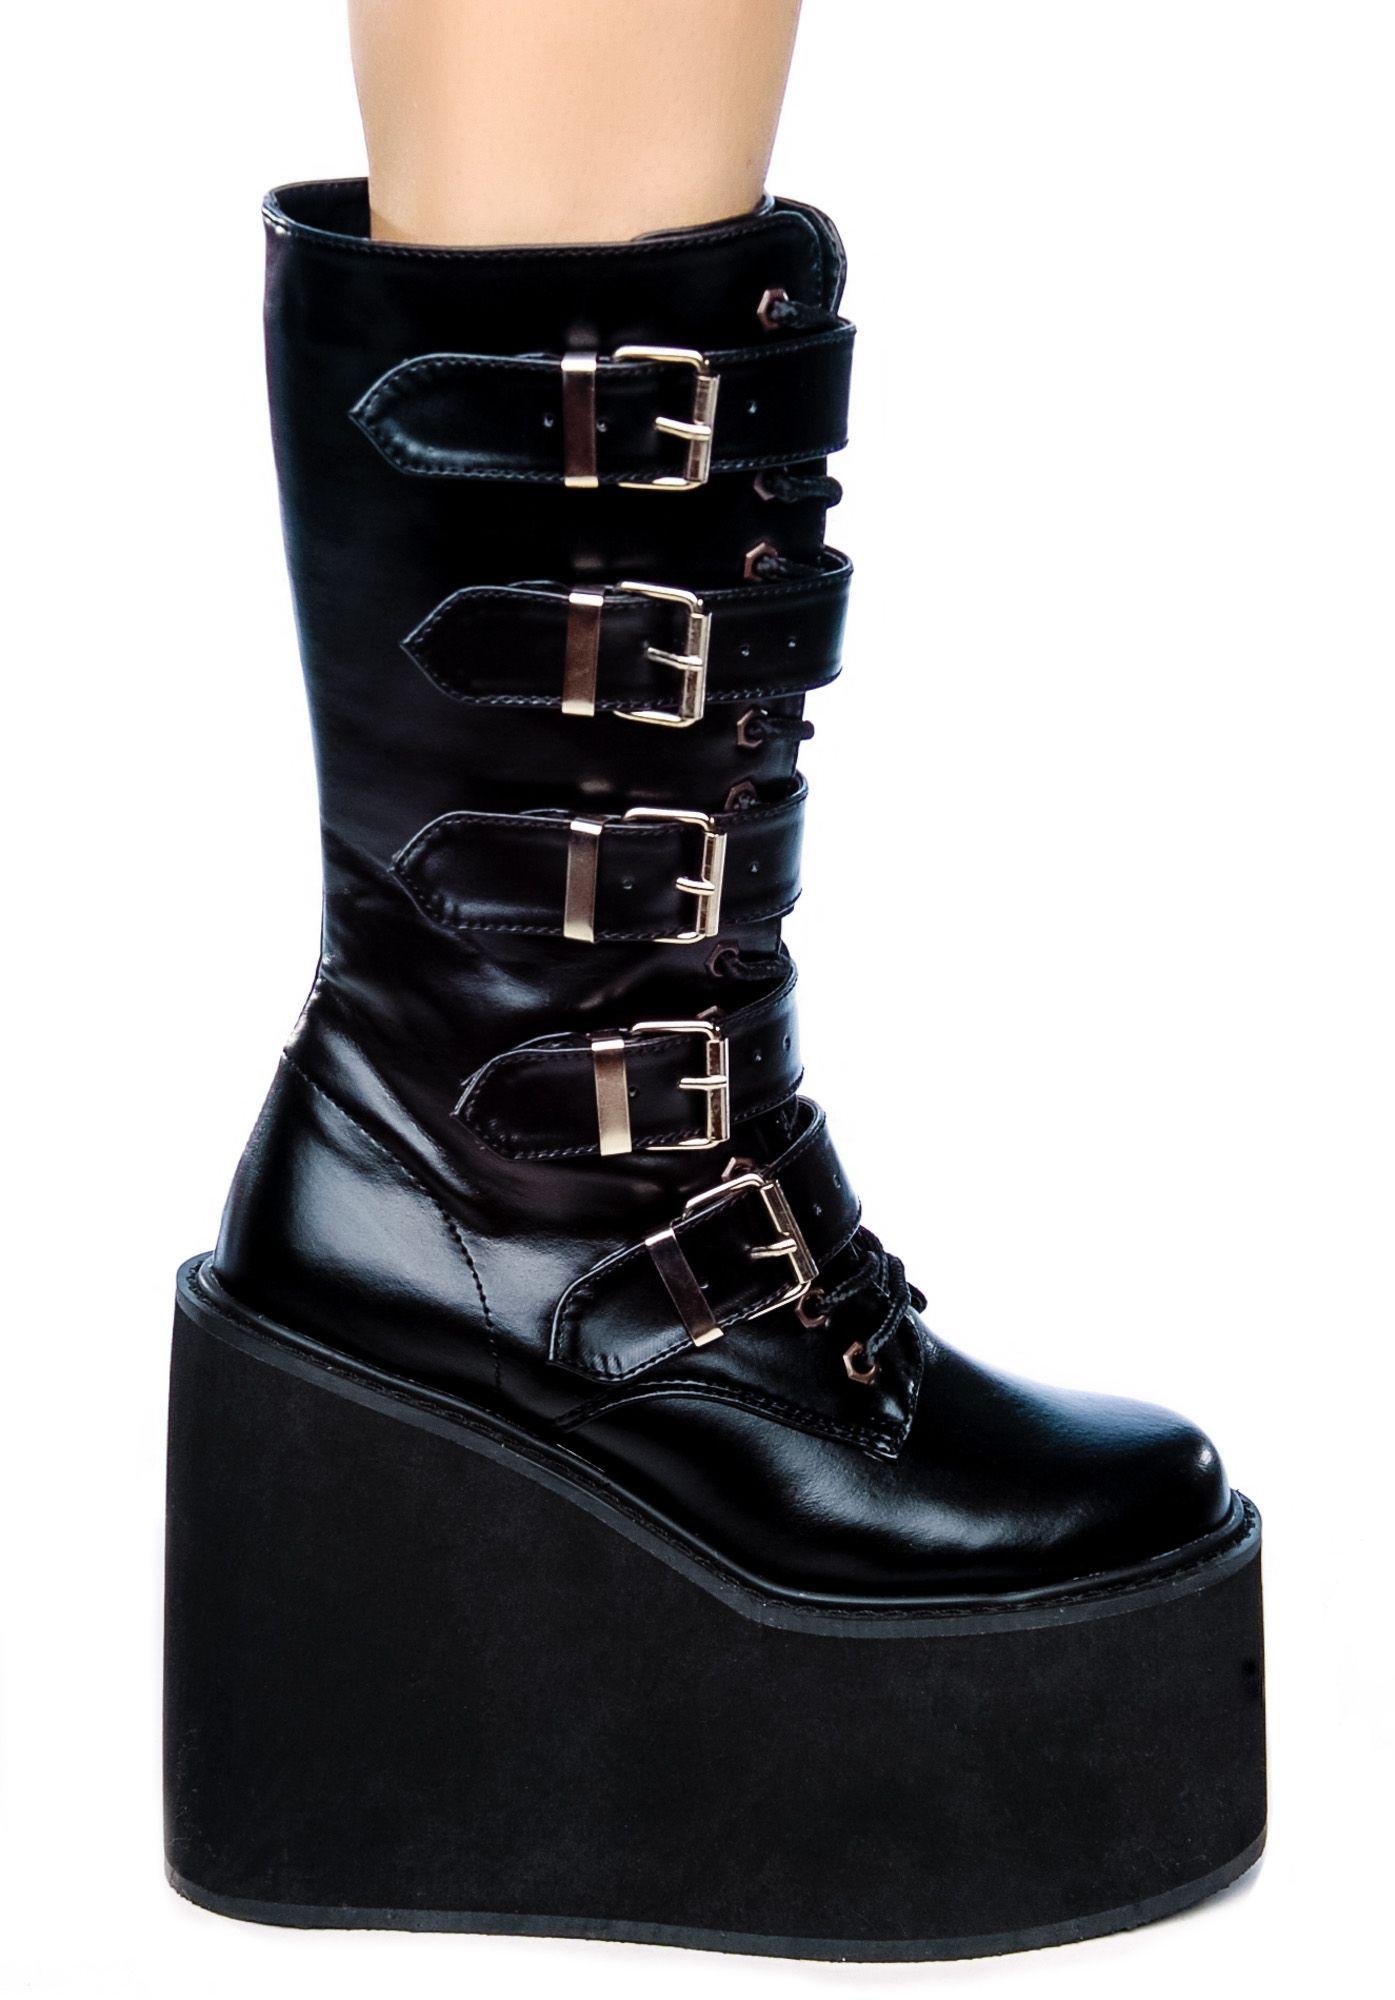 99f0863ccba Demonia Wicked Woodland Platform Goth Boots Fashion in 2018